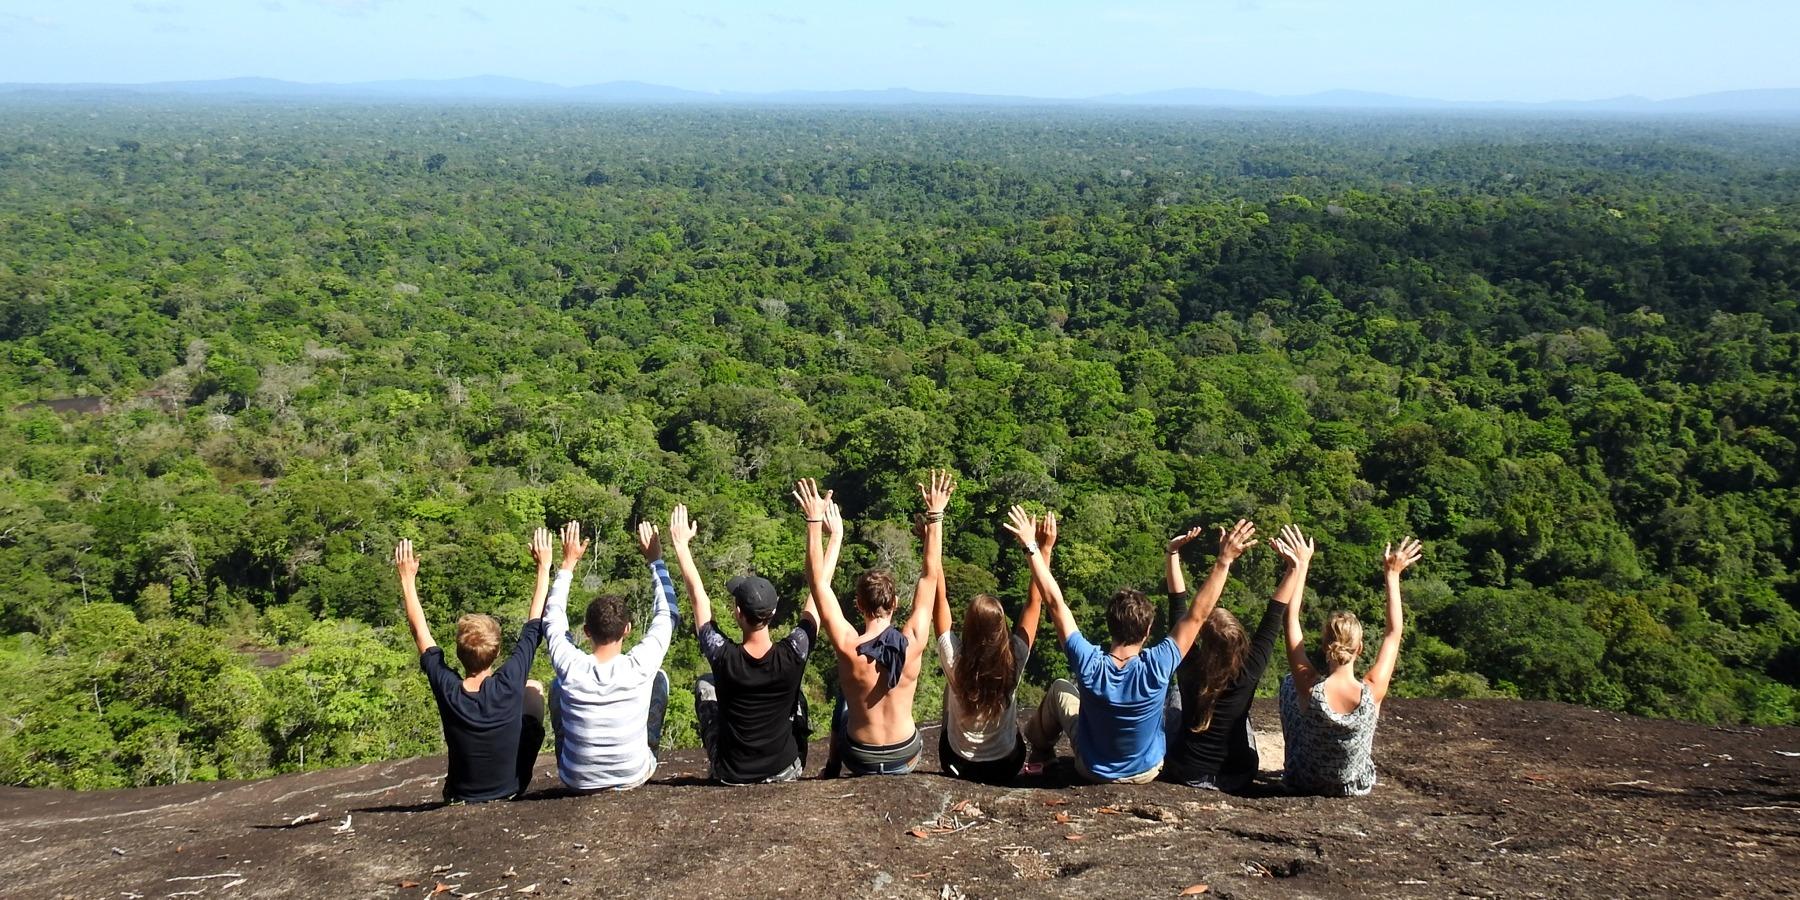 Tour Bedrijven In Suriname